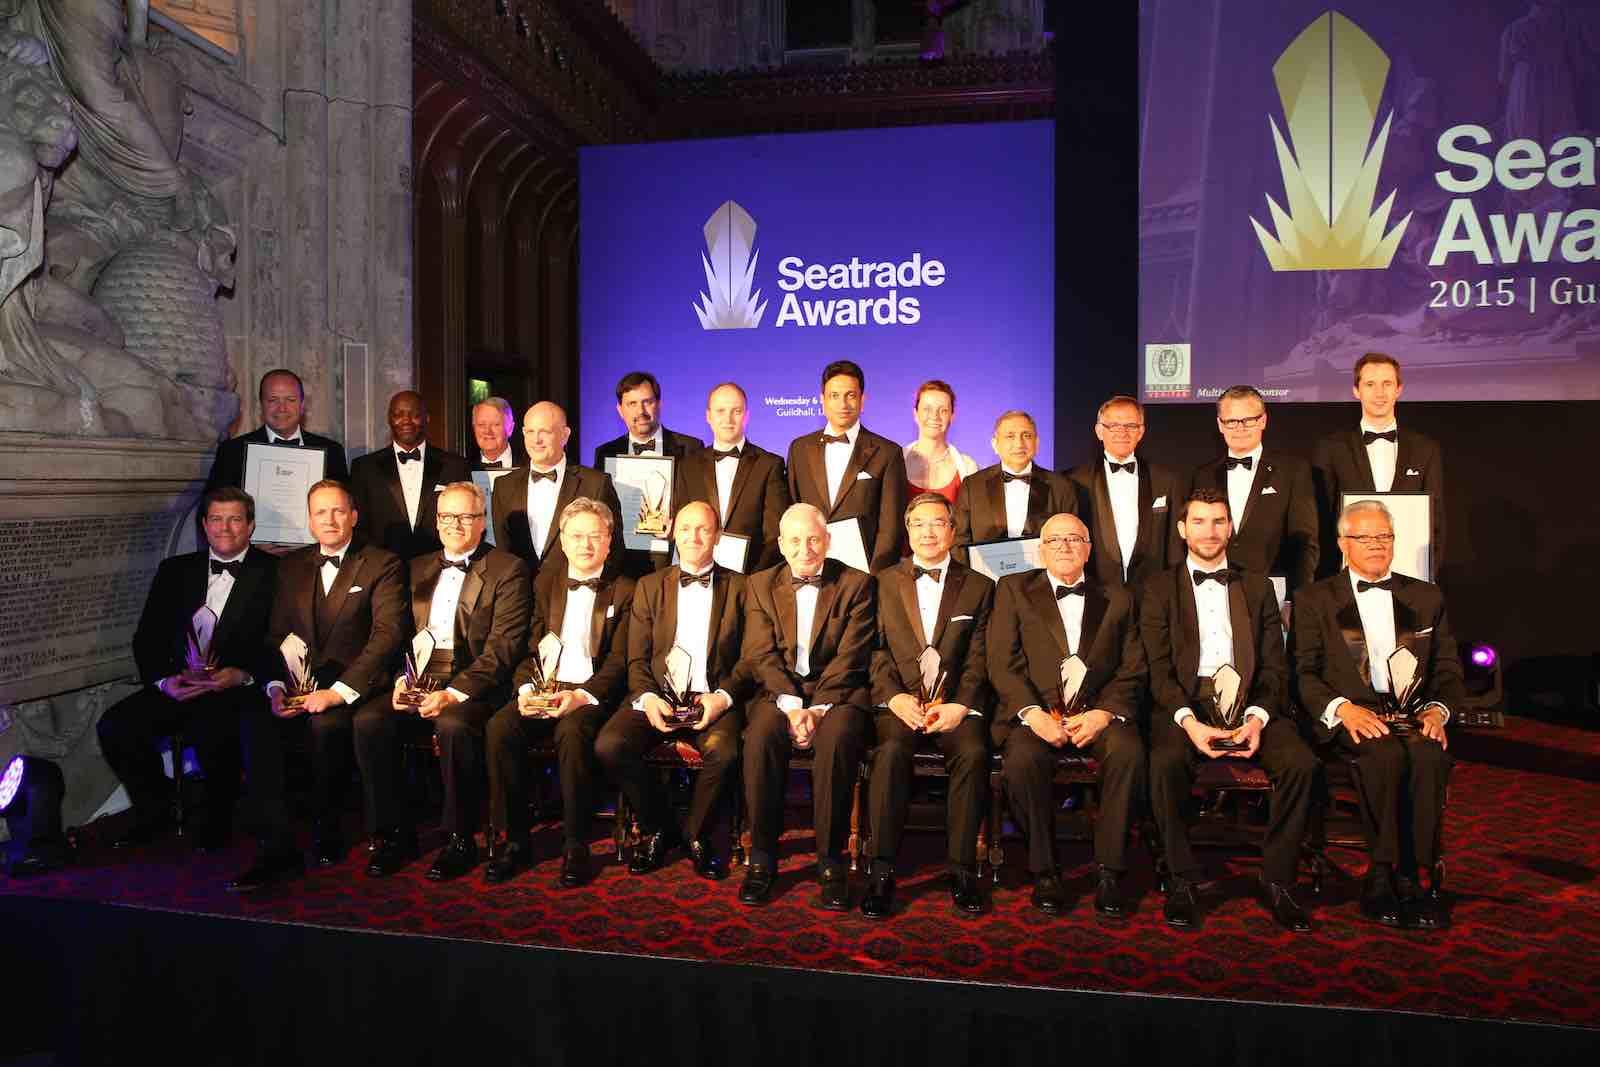 Capt Tsakos & IMO Secretary-General amongst Seatrade Award winners